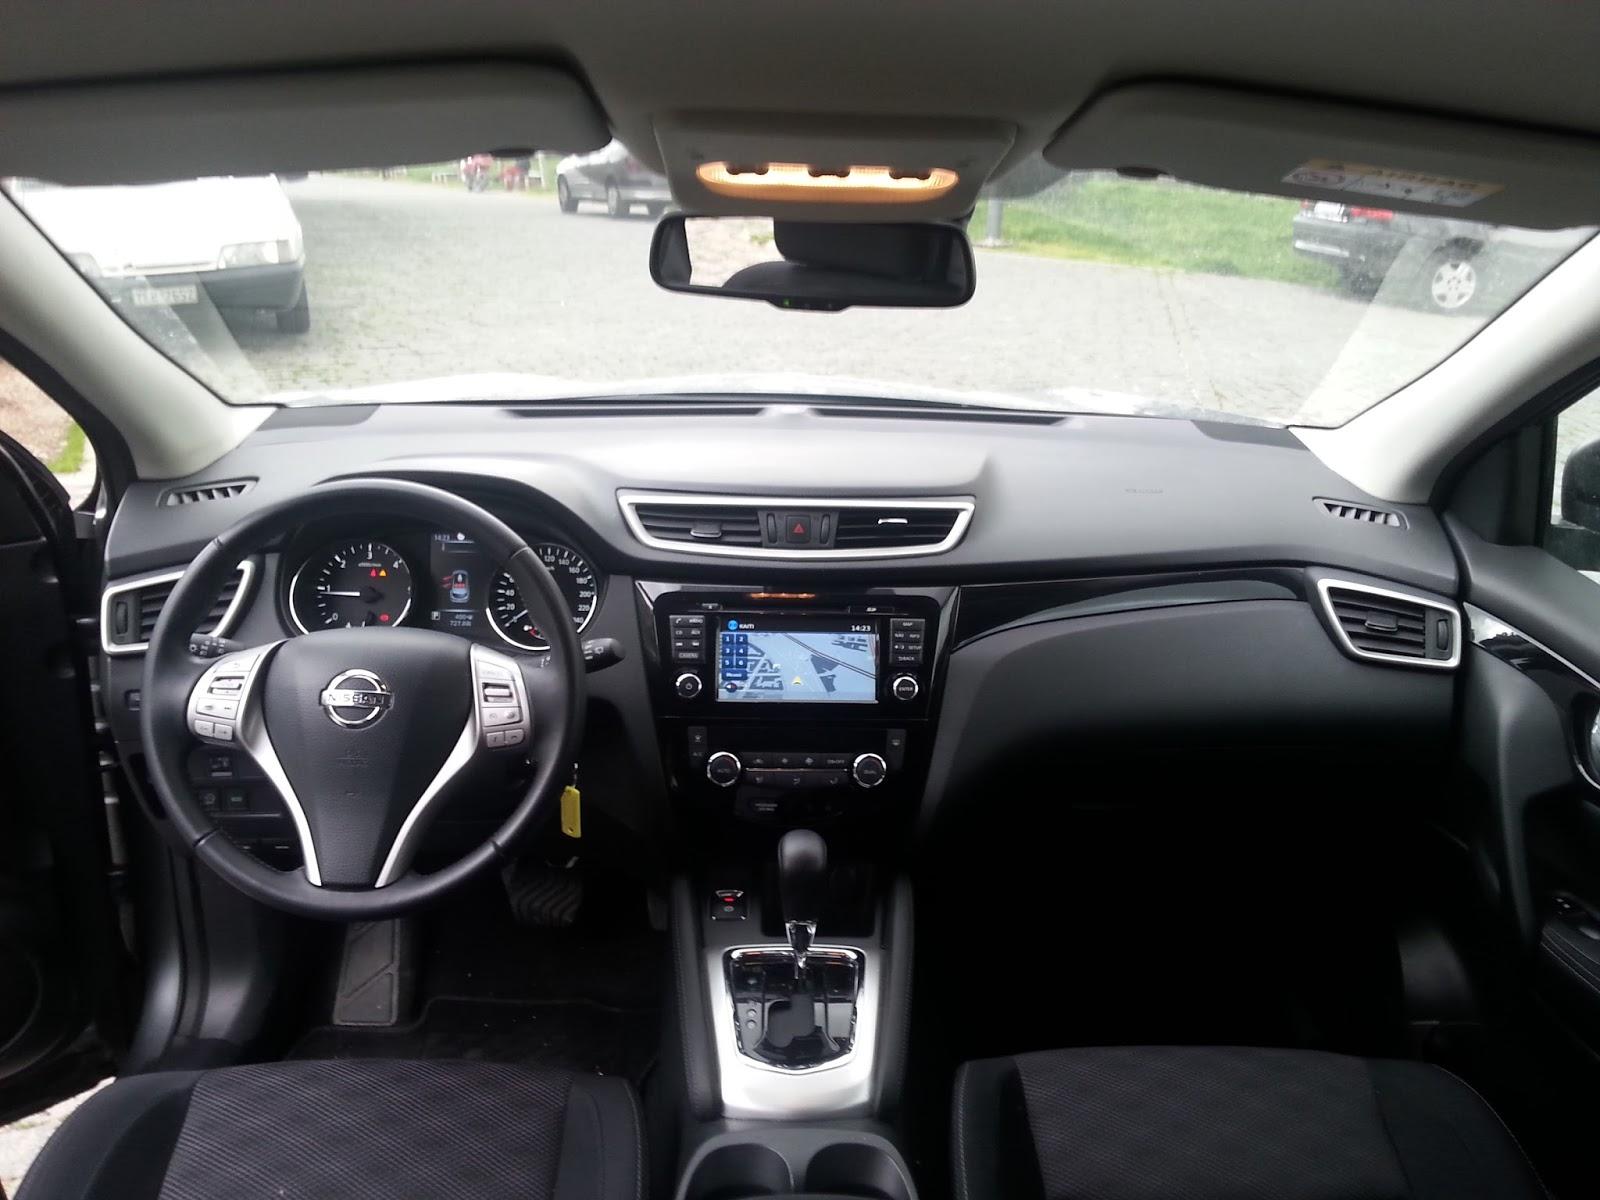 F3 Οδηγούμε (παντού) το Nissan Qashqai